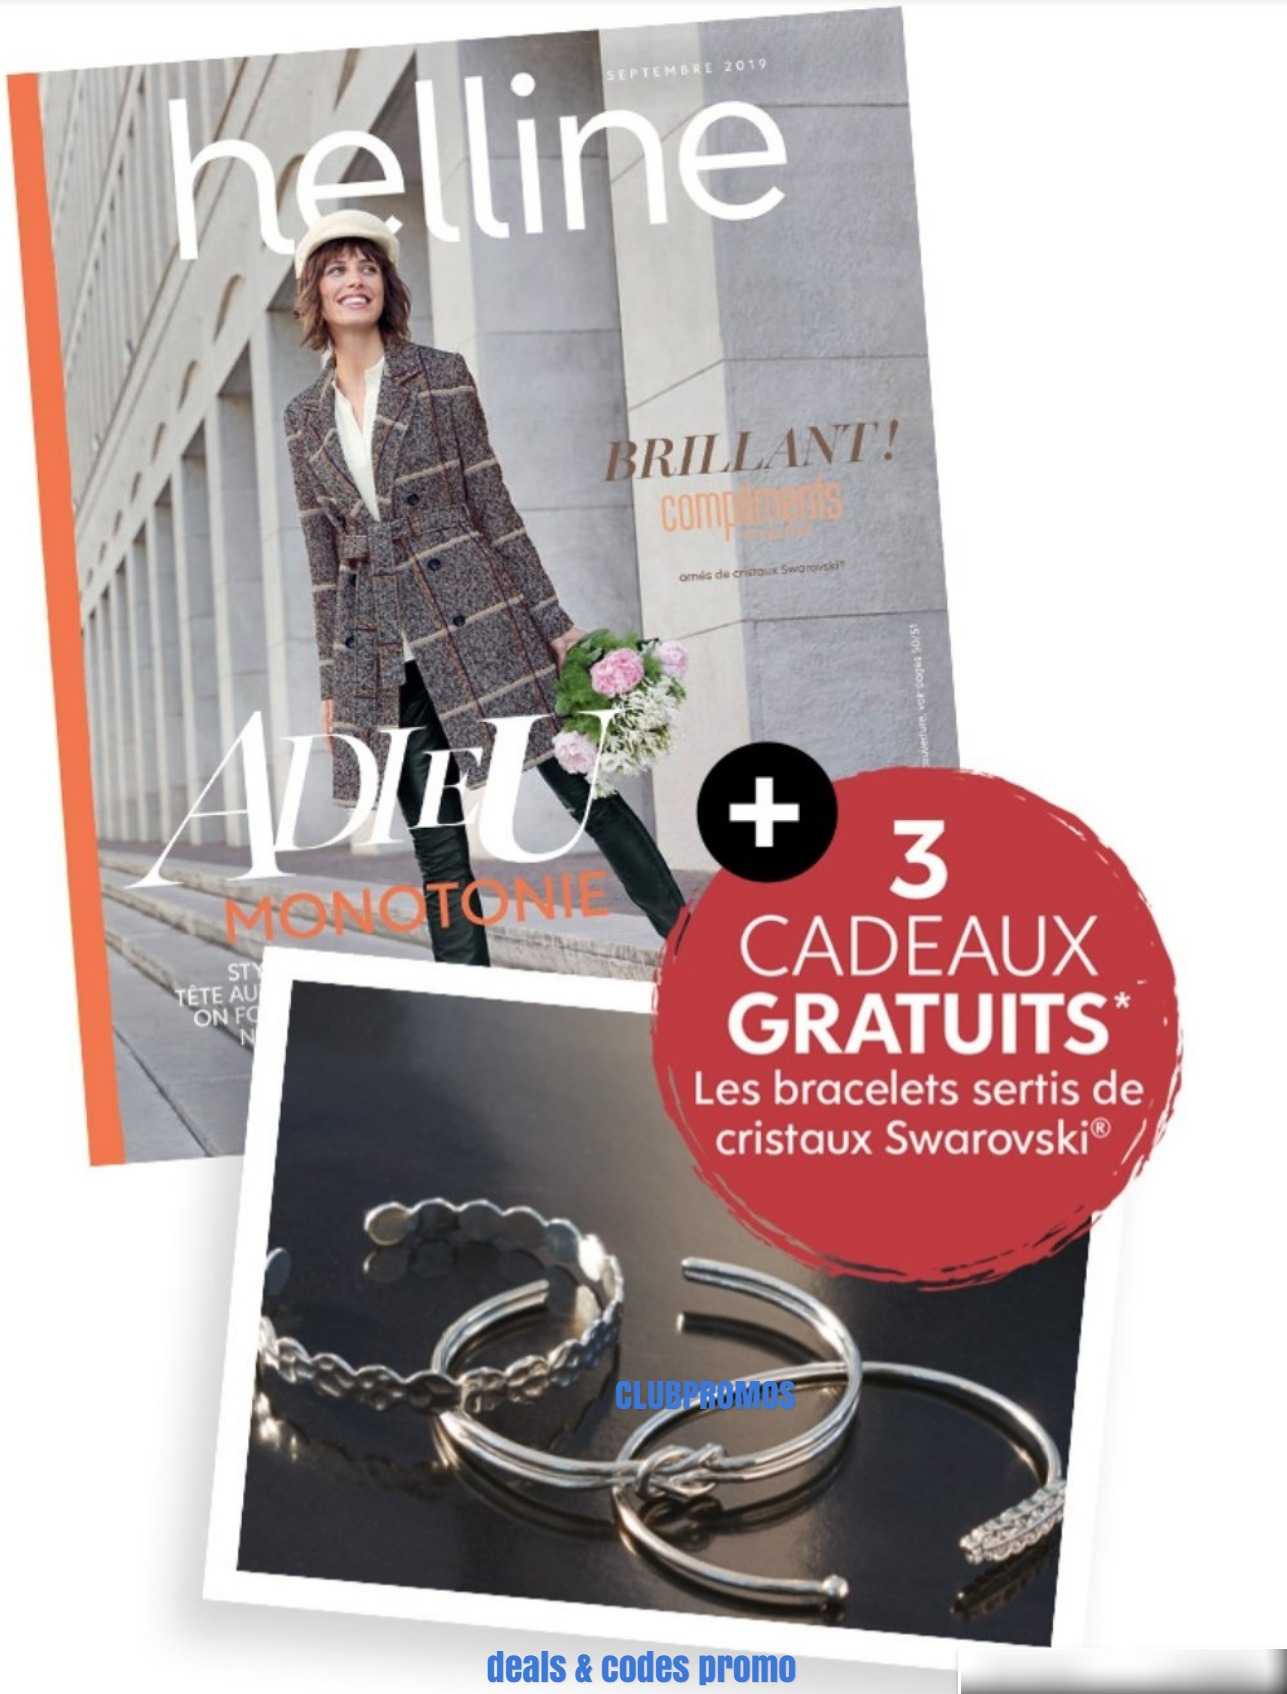 code promo - Lot de 3 bracelets sertis de cristaux swarovski sur Helline (2).jpg